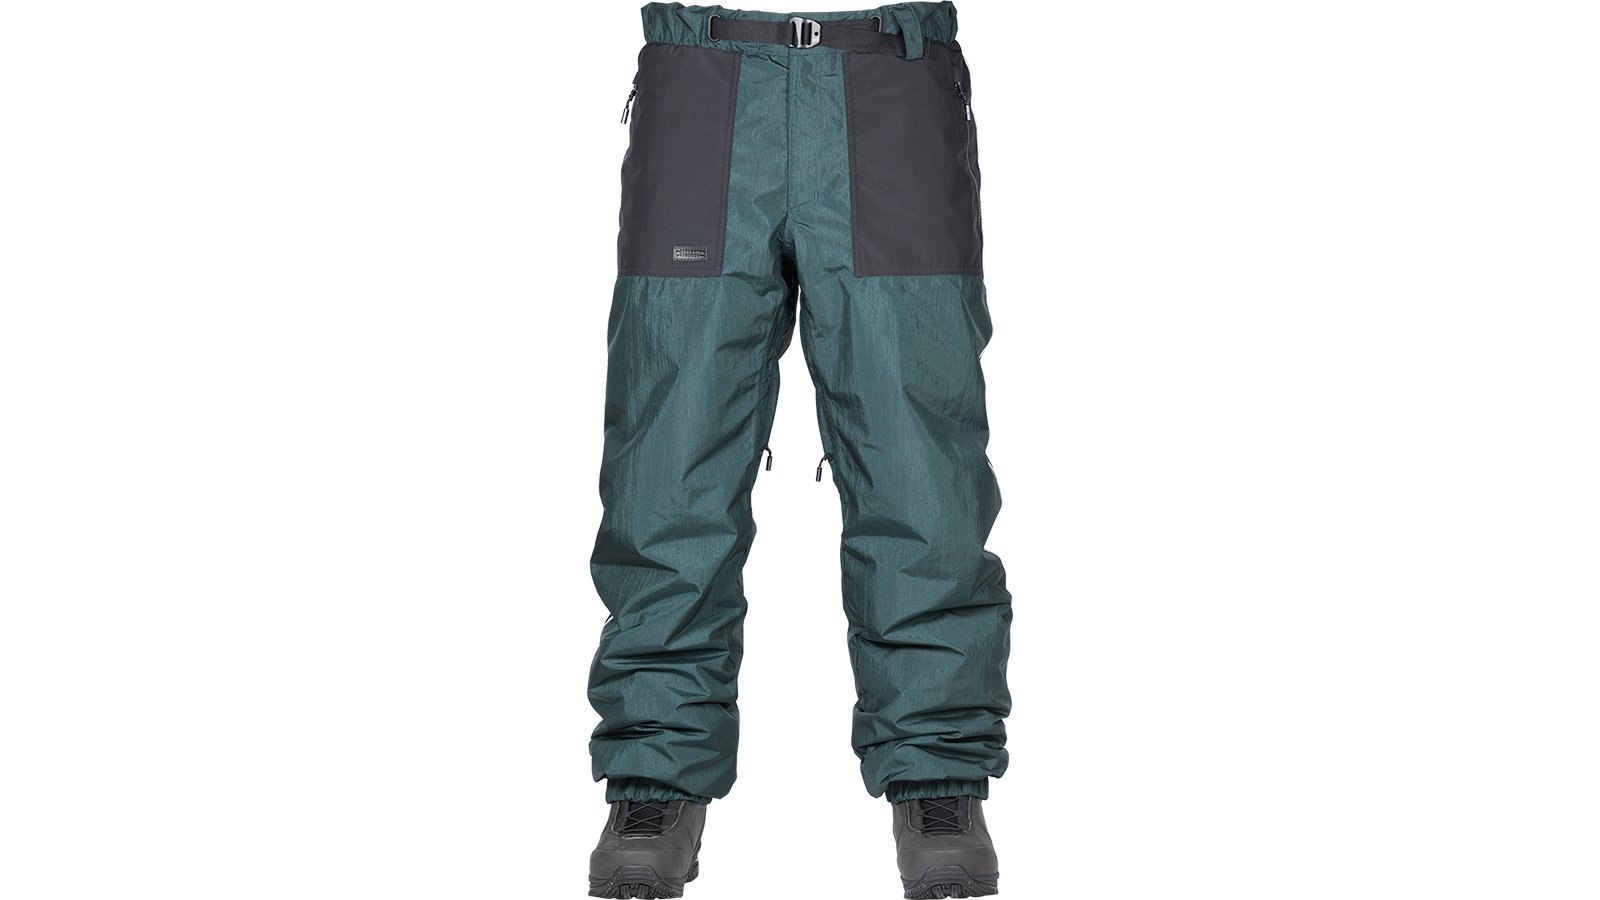 L1 FW20/21 Men's Outerwear Preview